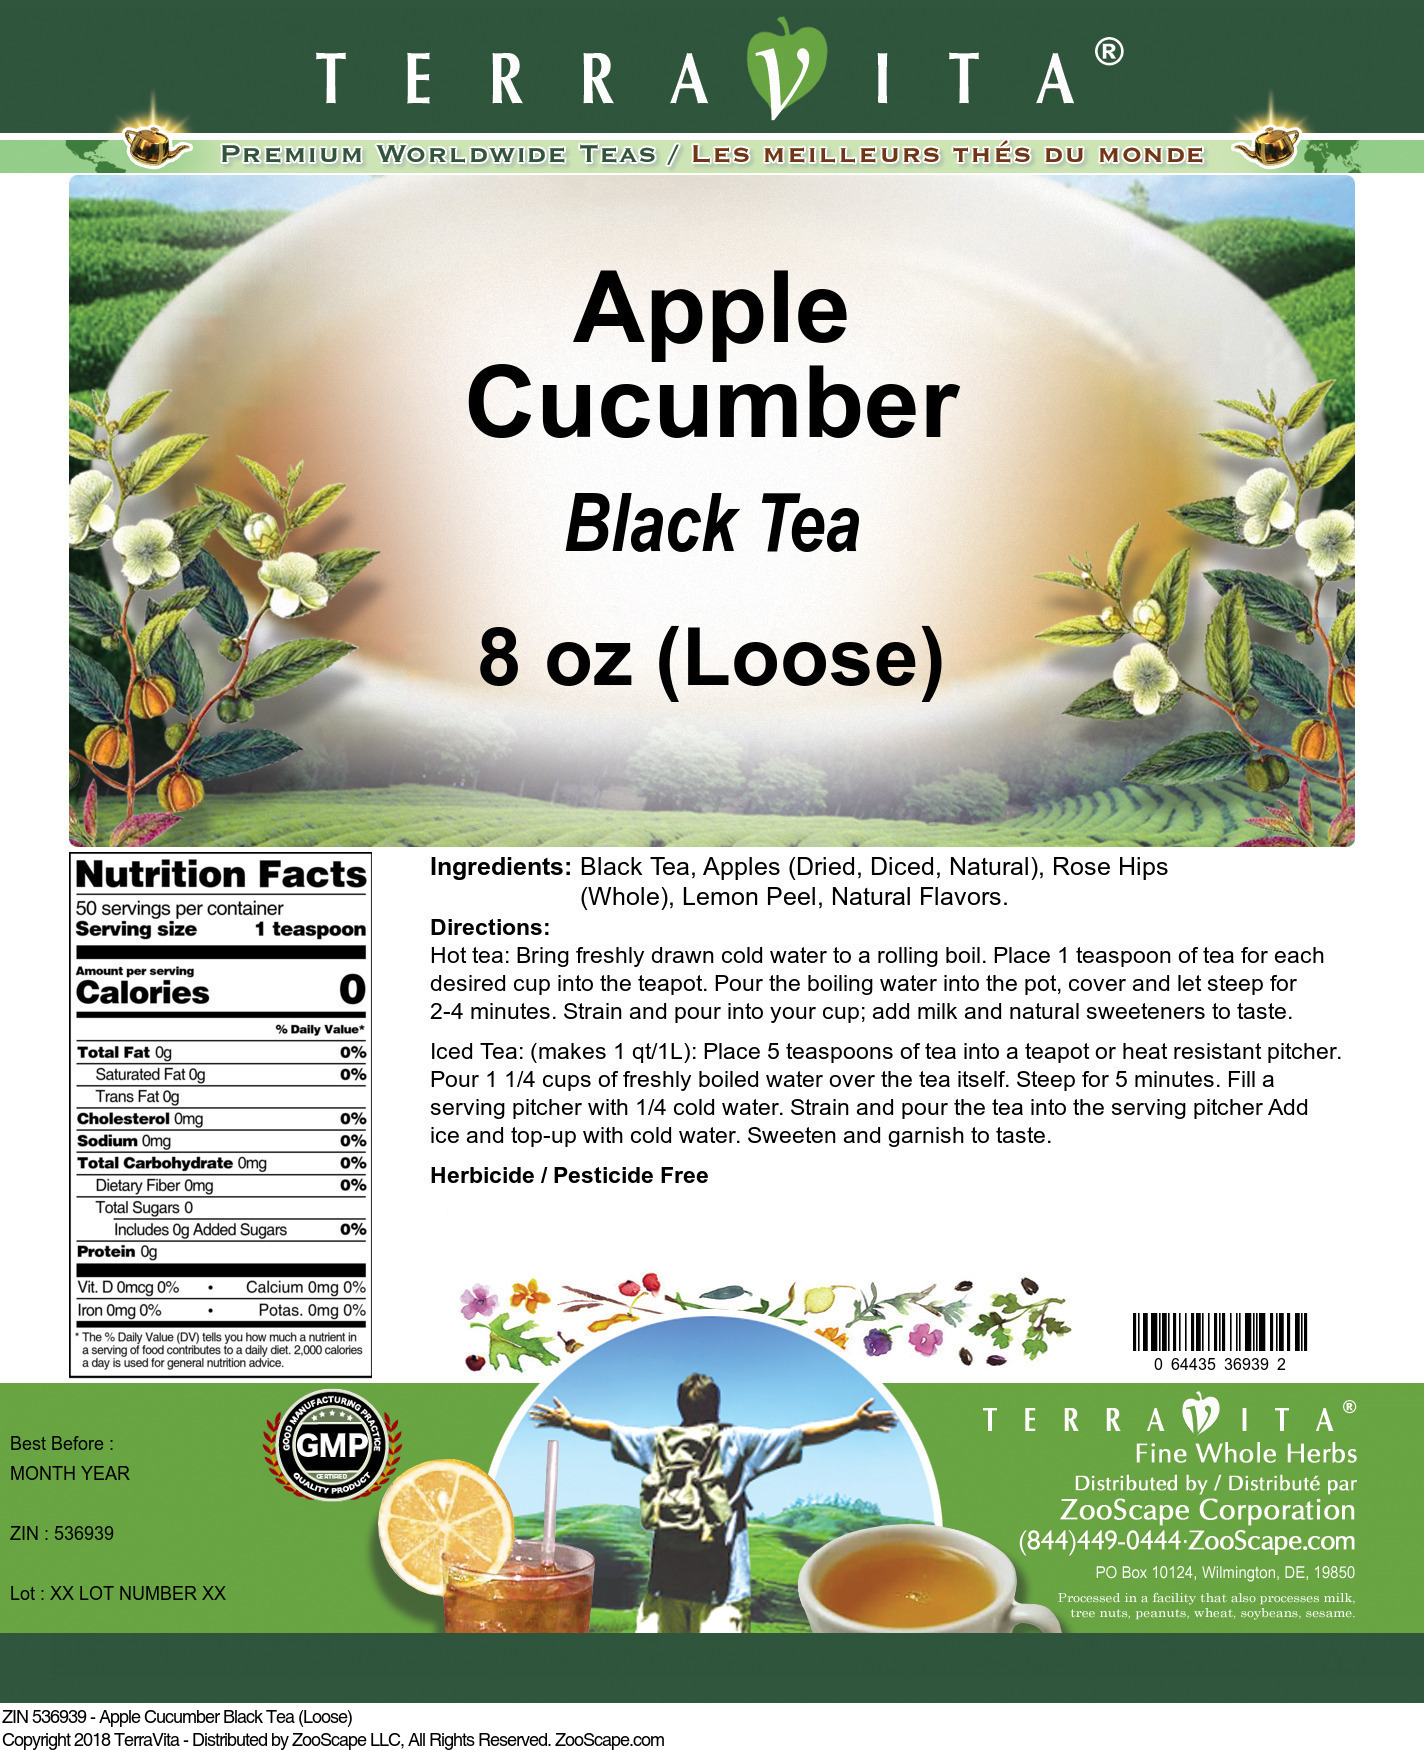 Apple Cucumber Black Tea (Loose)